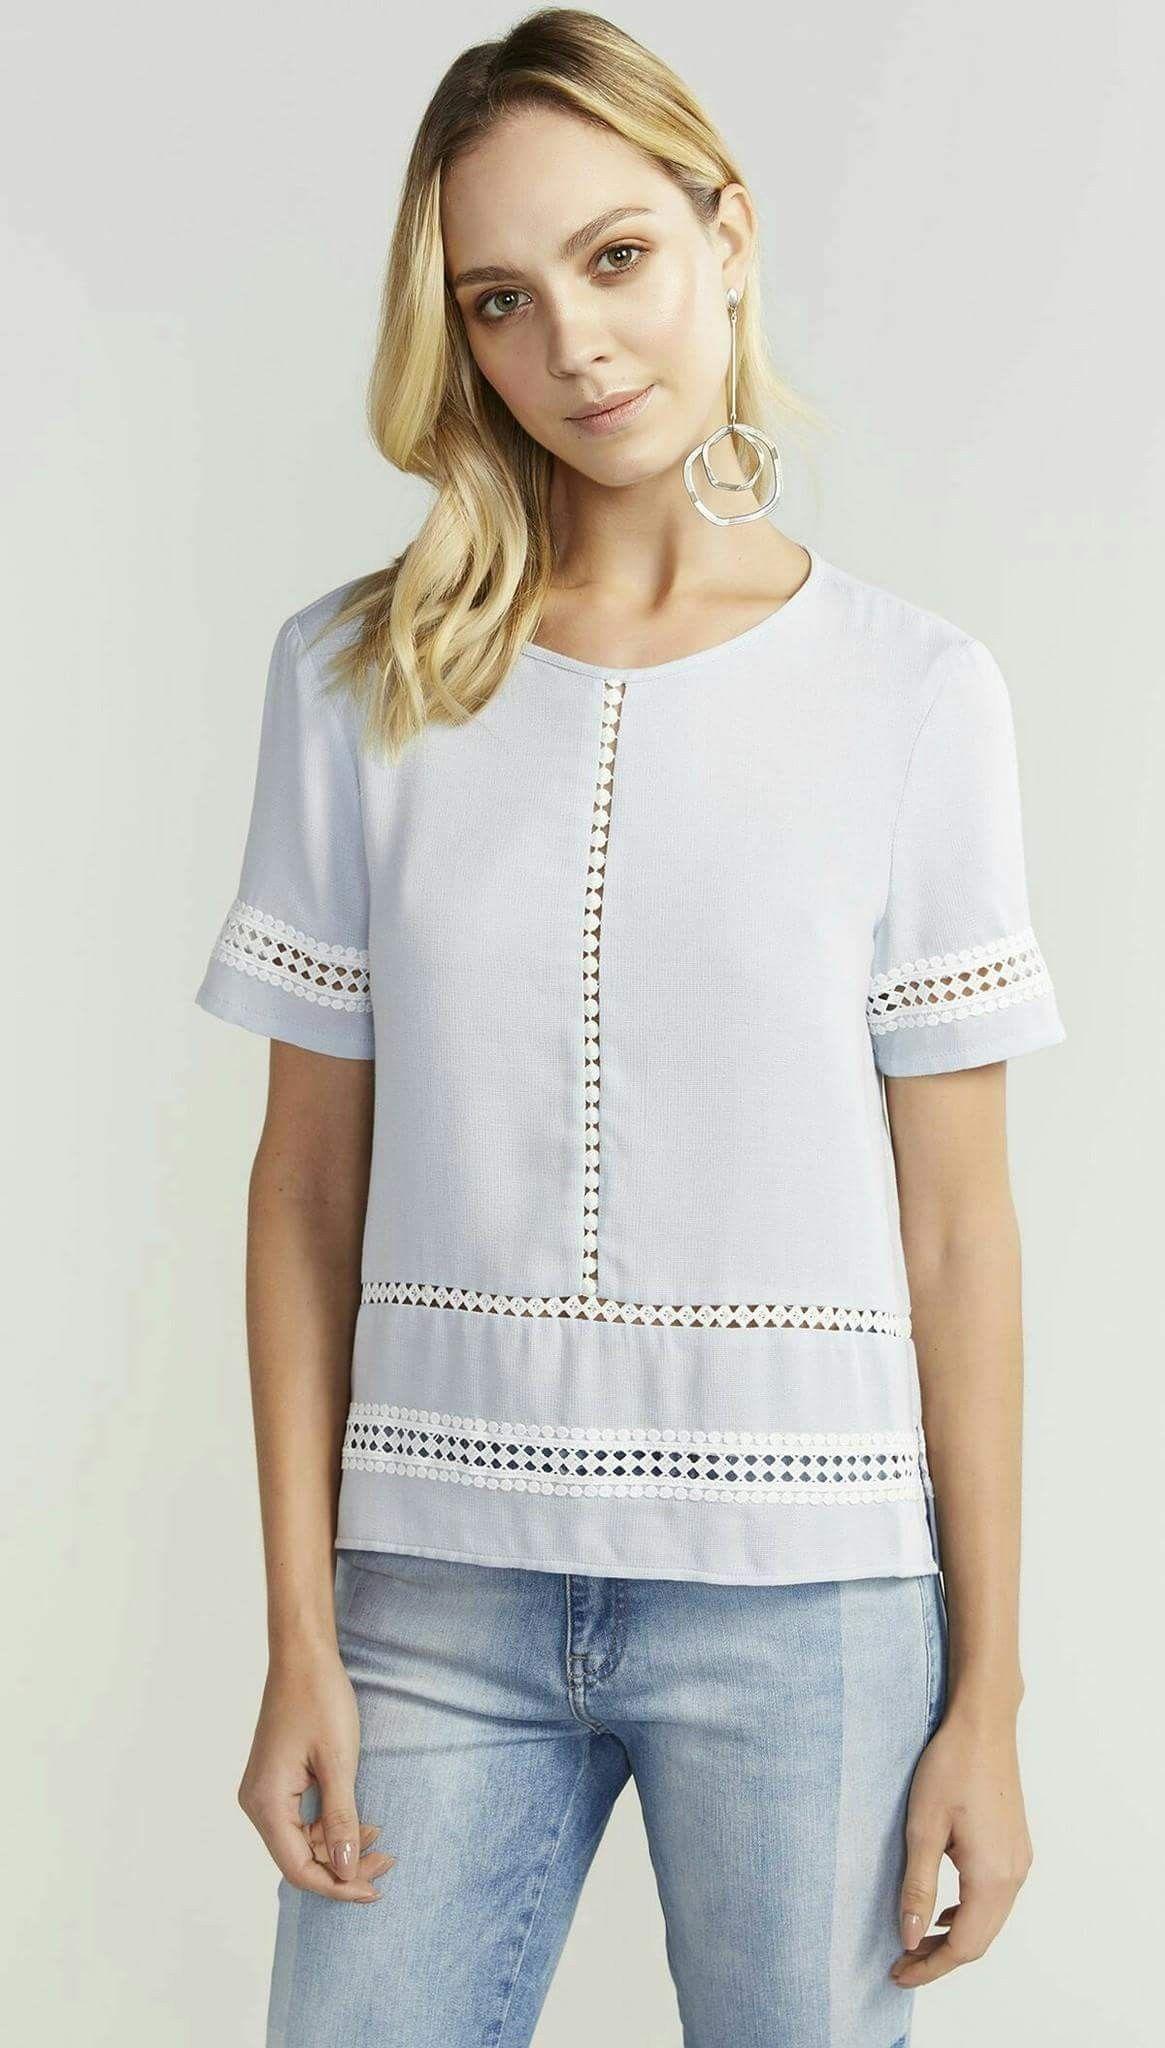 Pin De Lorena Aquino En Bata Blusas Bonitas Blusas Blusas Blancas